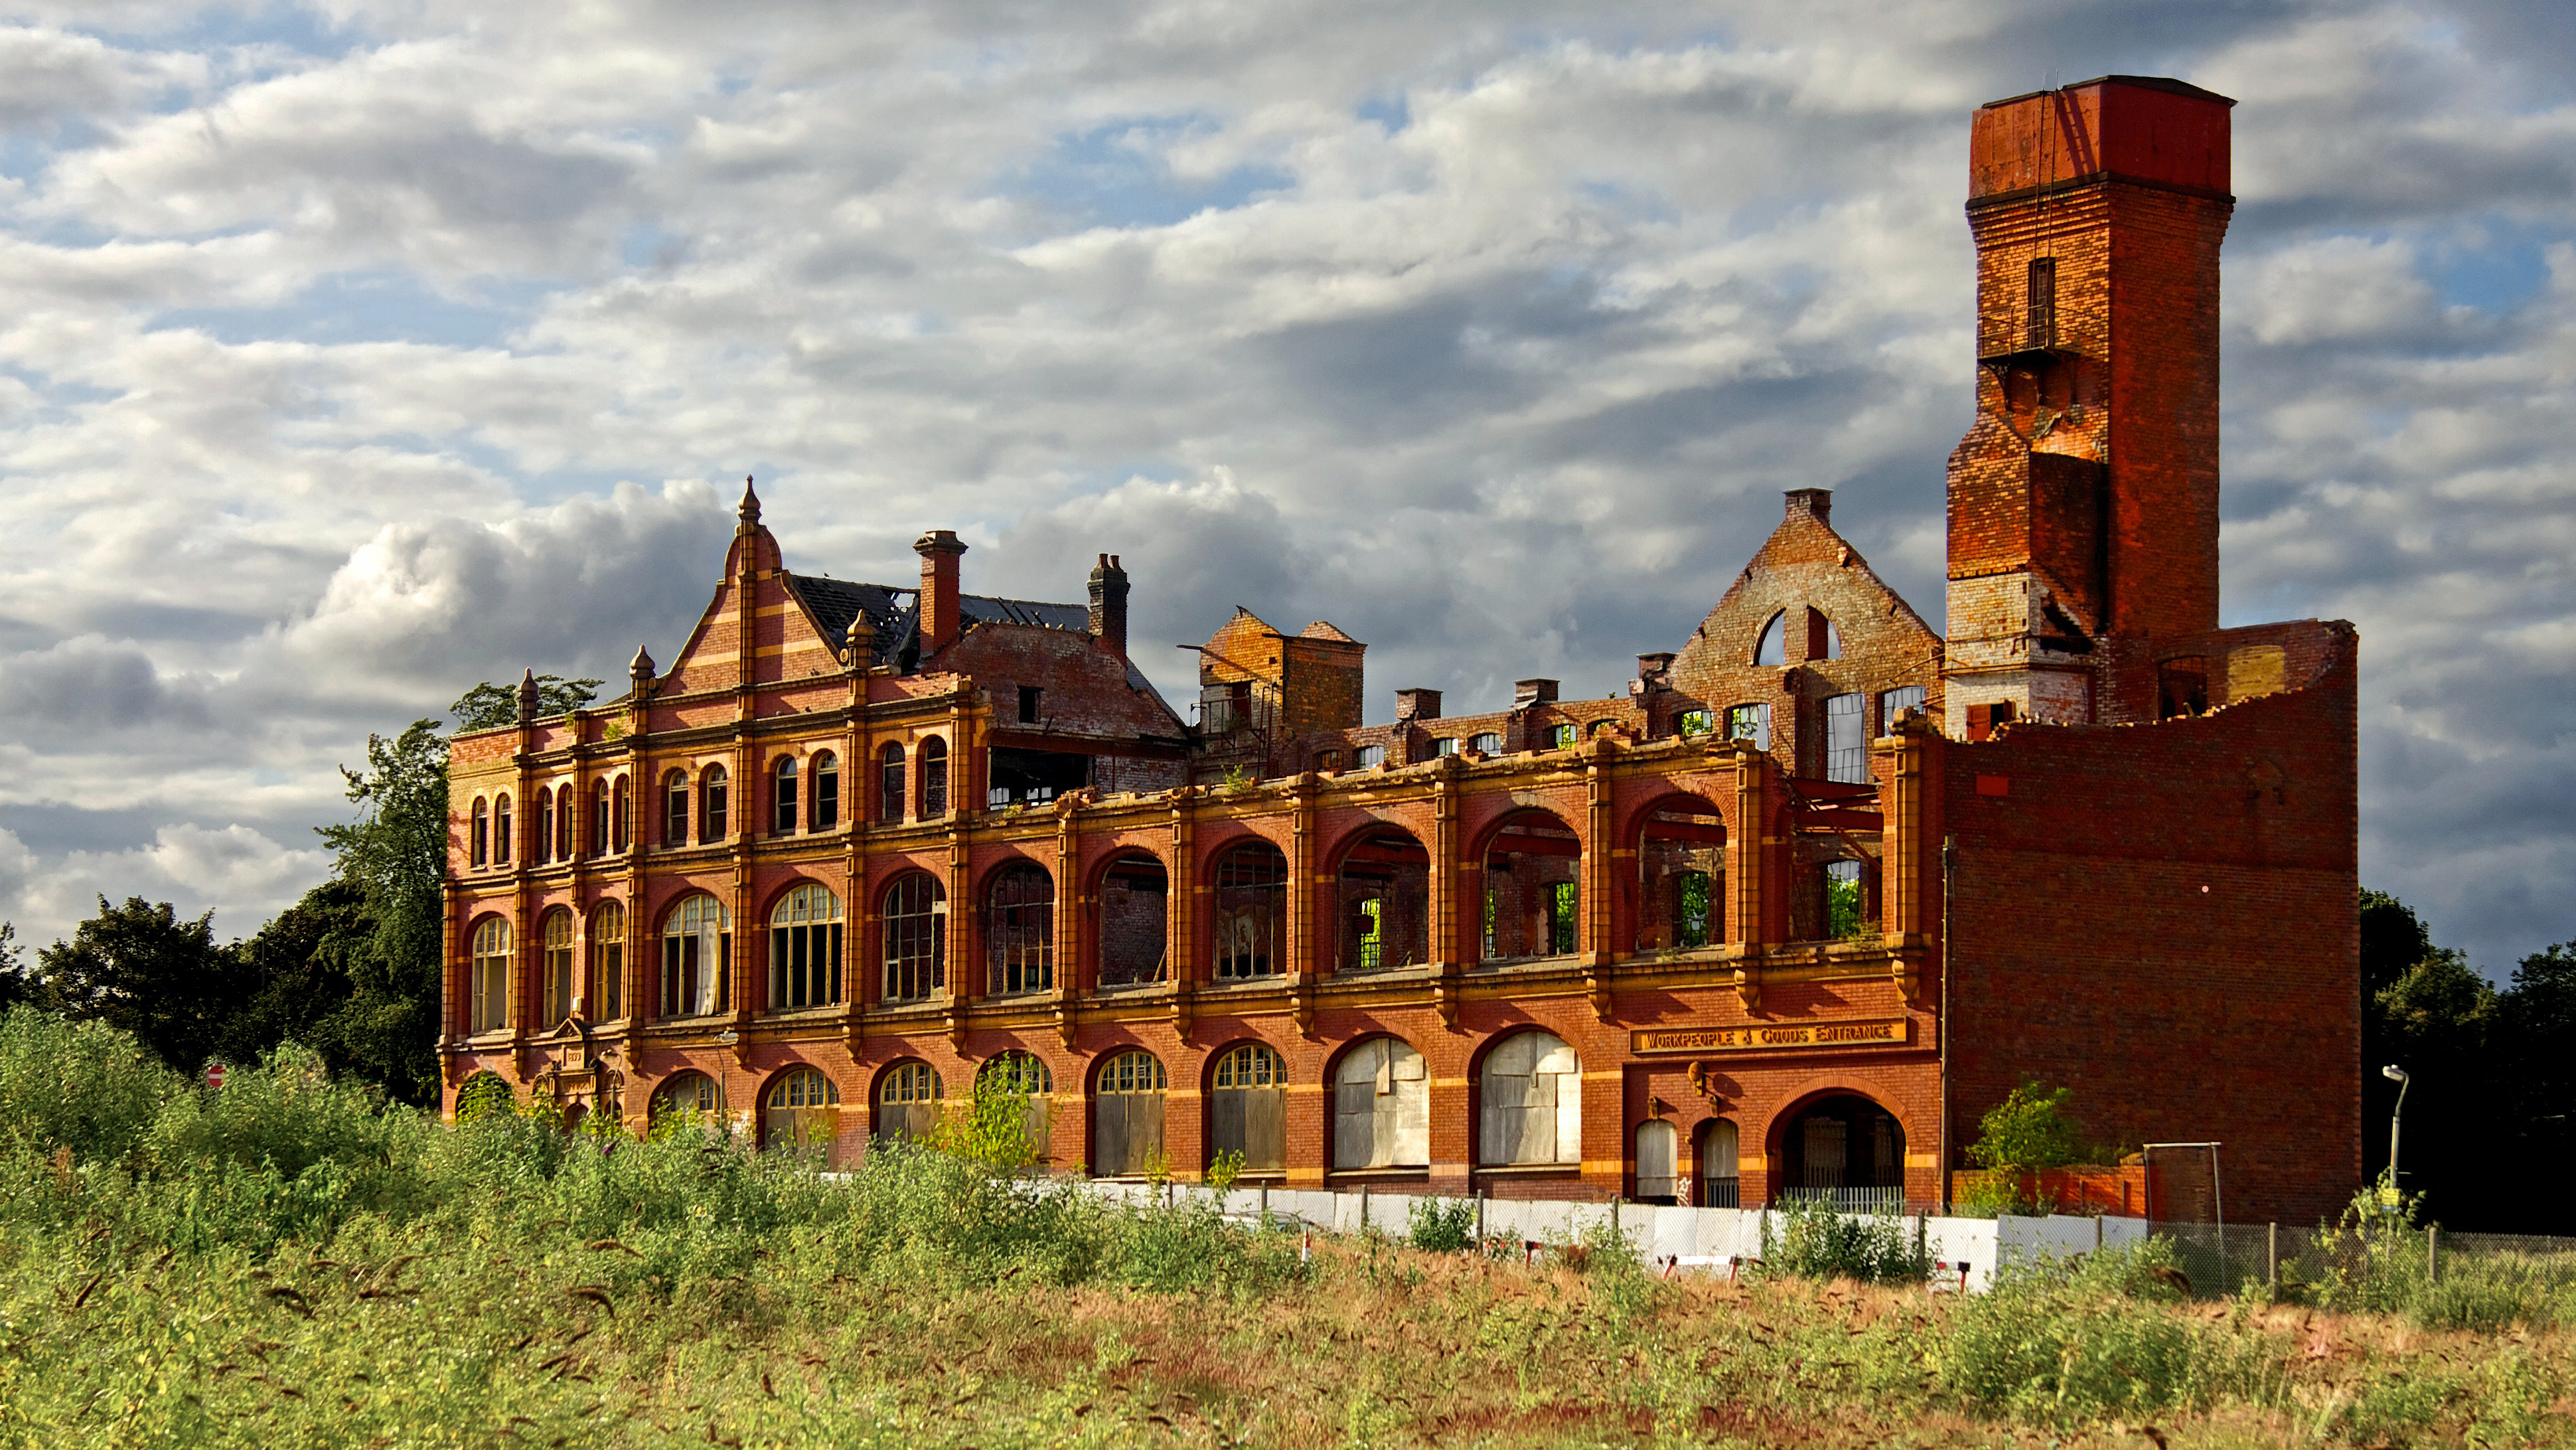 File:Belmont Row Works, Birmingham.jpg - Wikimedia Commons